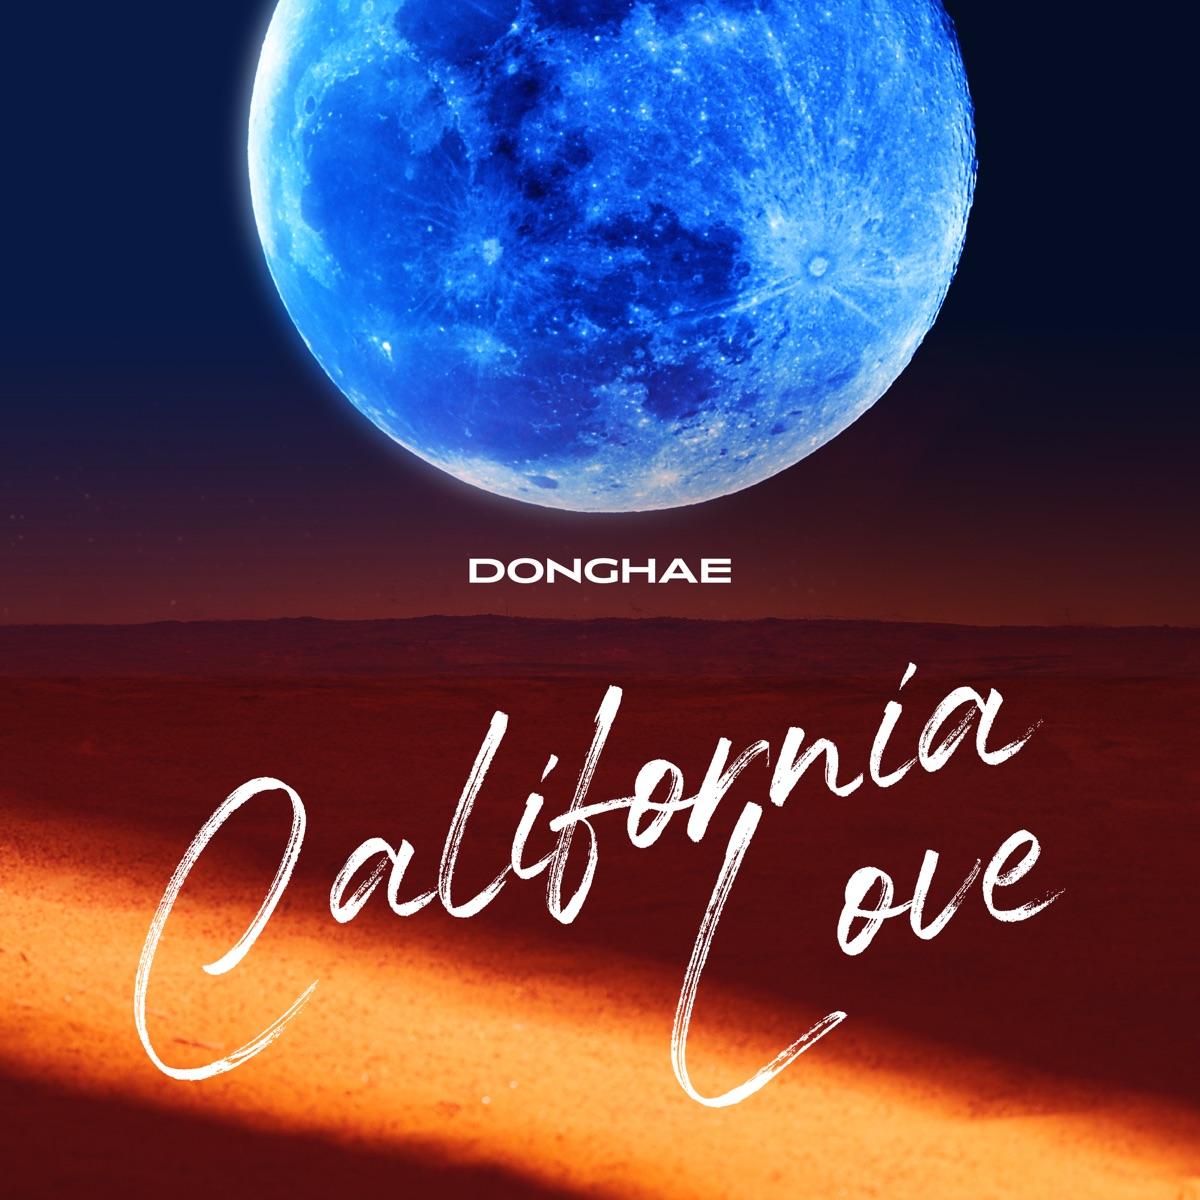 『DONGHAE - California Love (Feat. JENO of NCT)』収録の『California Love』ジャケット